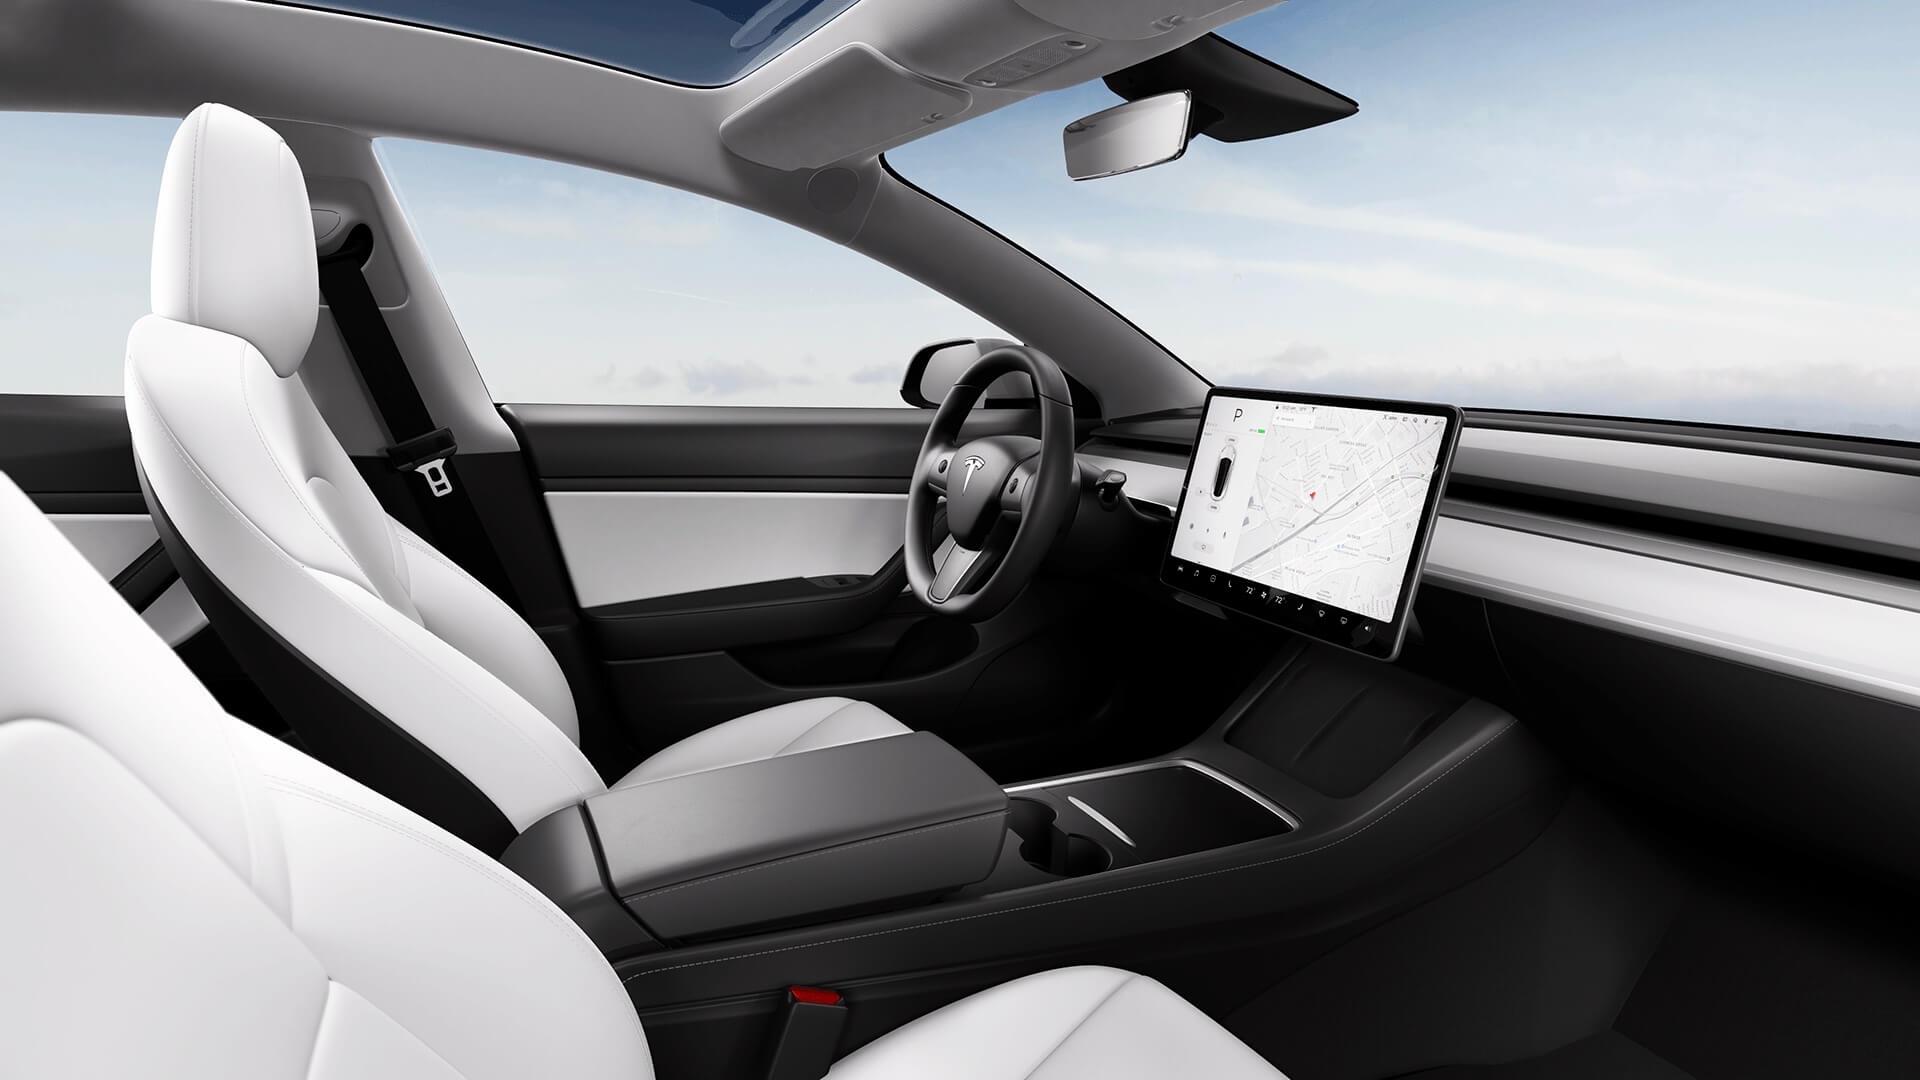 2021 Tesla Model 3 interieur zetels